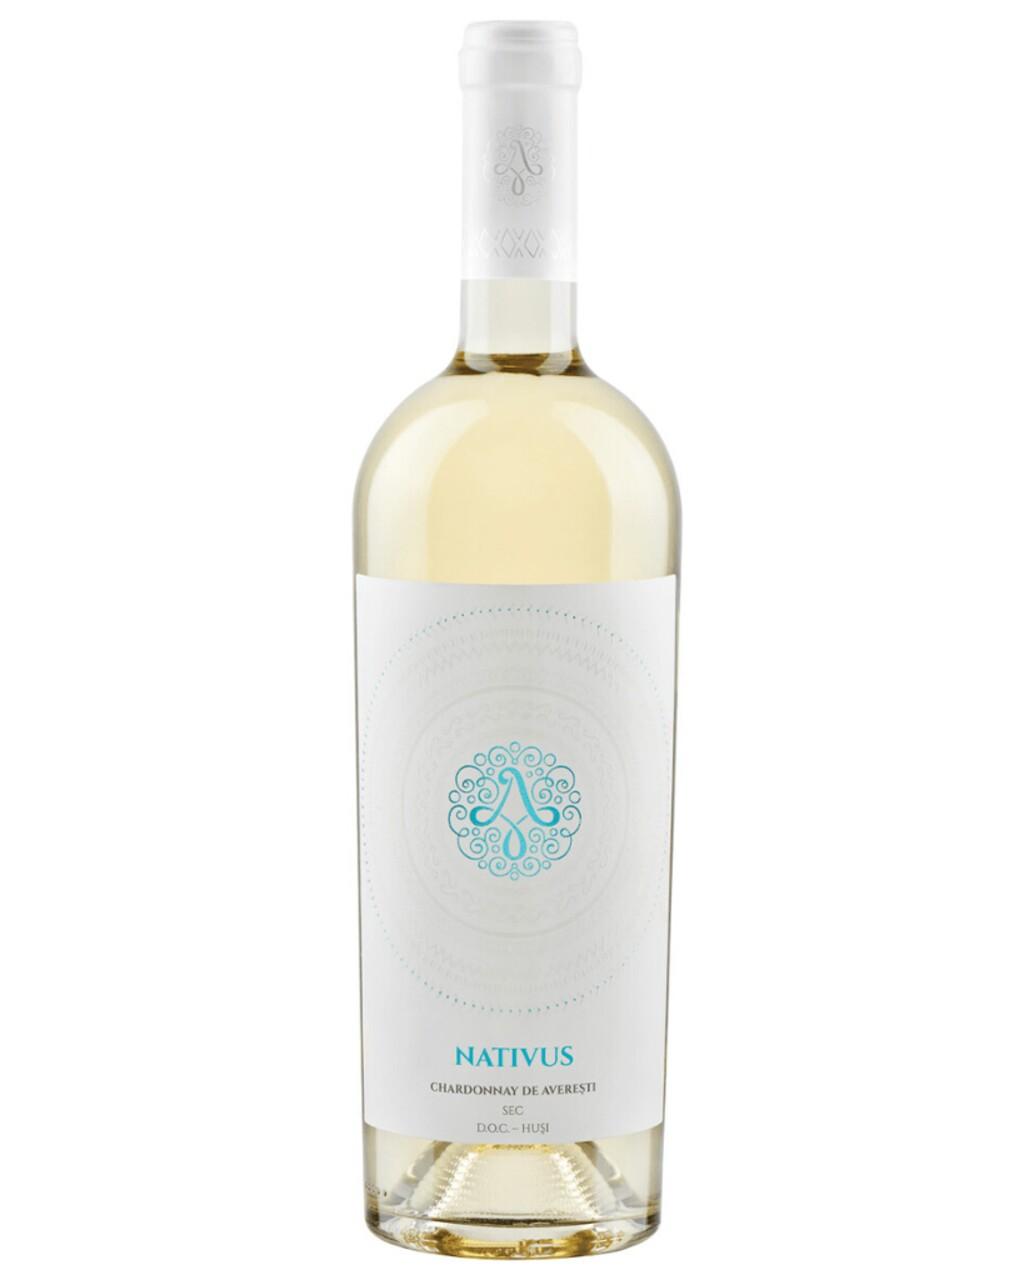 Chardonnay de Averesti Nativus